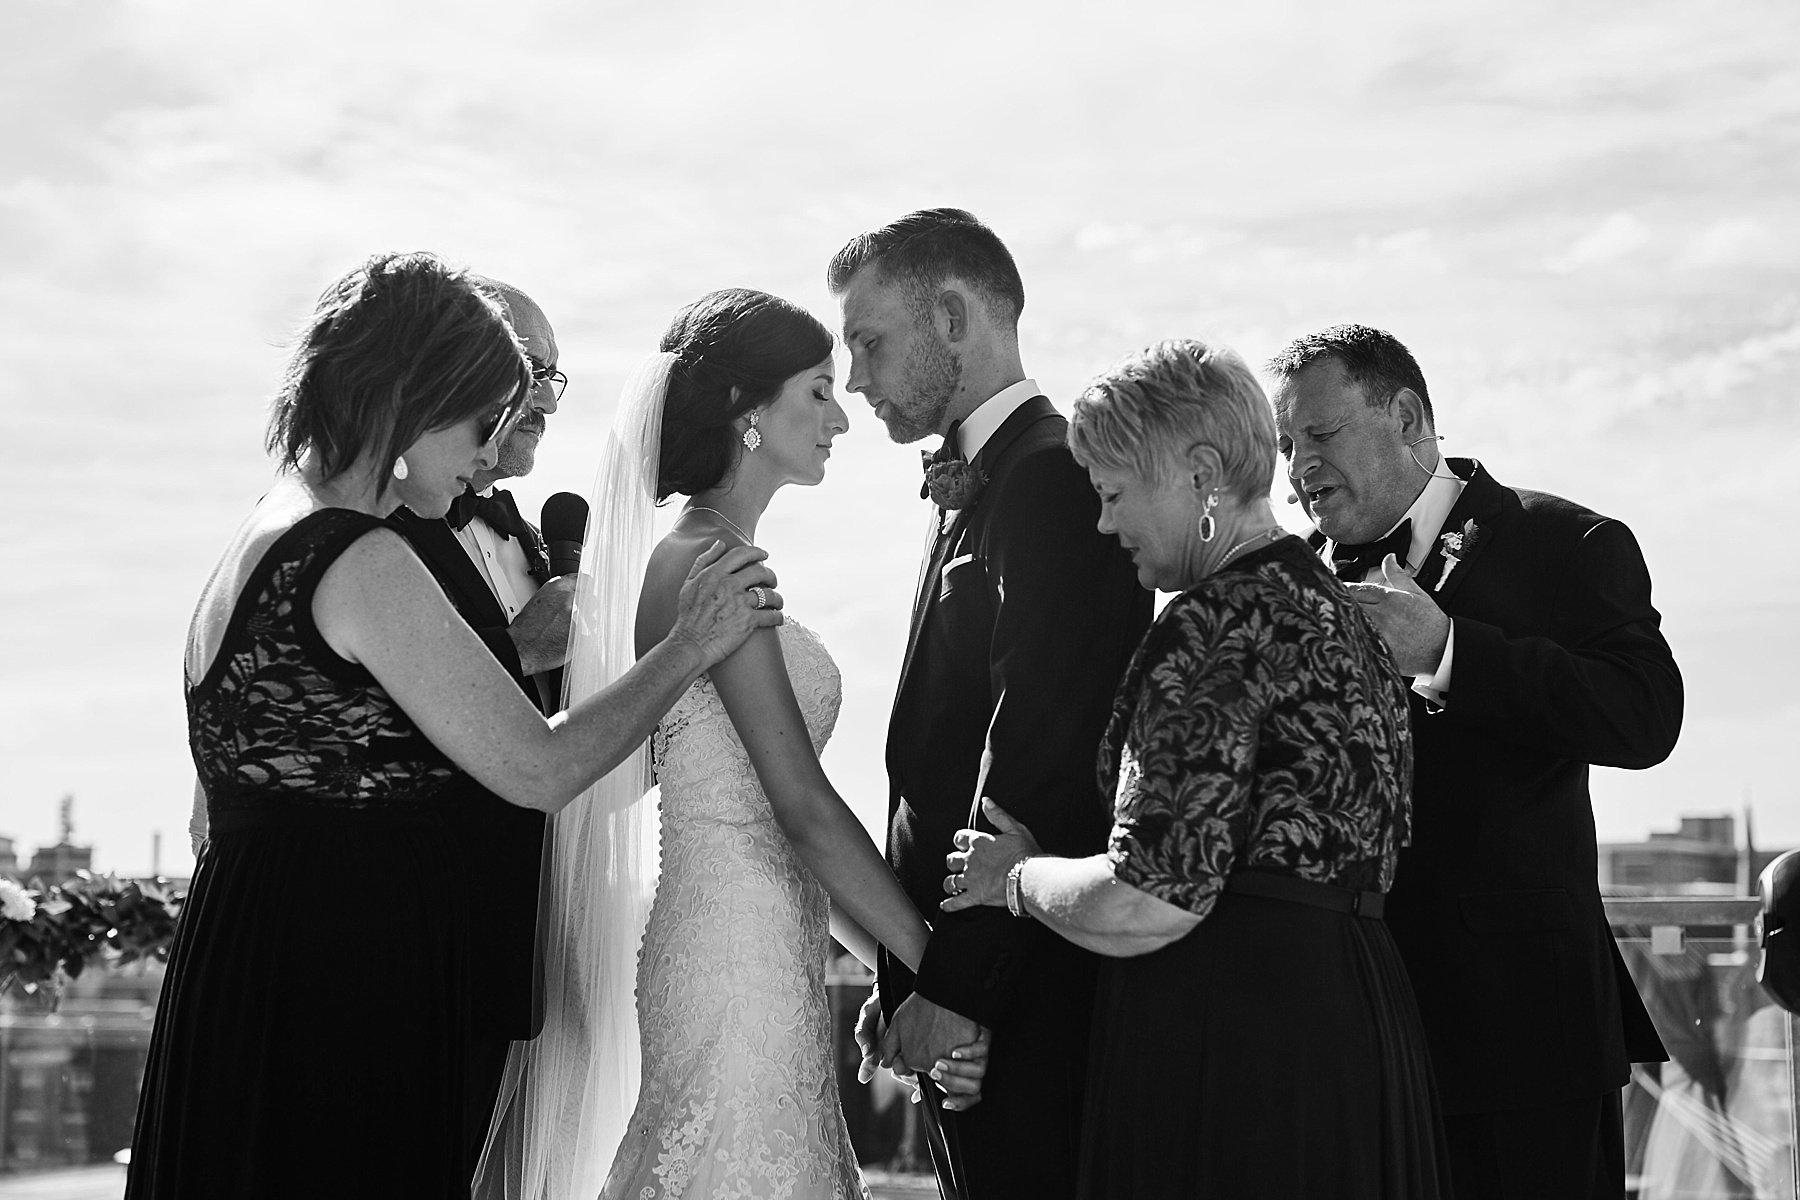 ABULAE-Wedding-Saint-paul-MN-Josh-Sofia-Wedding-Mears-Park_0772.jpg